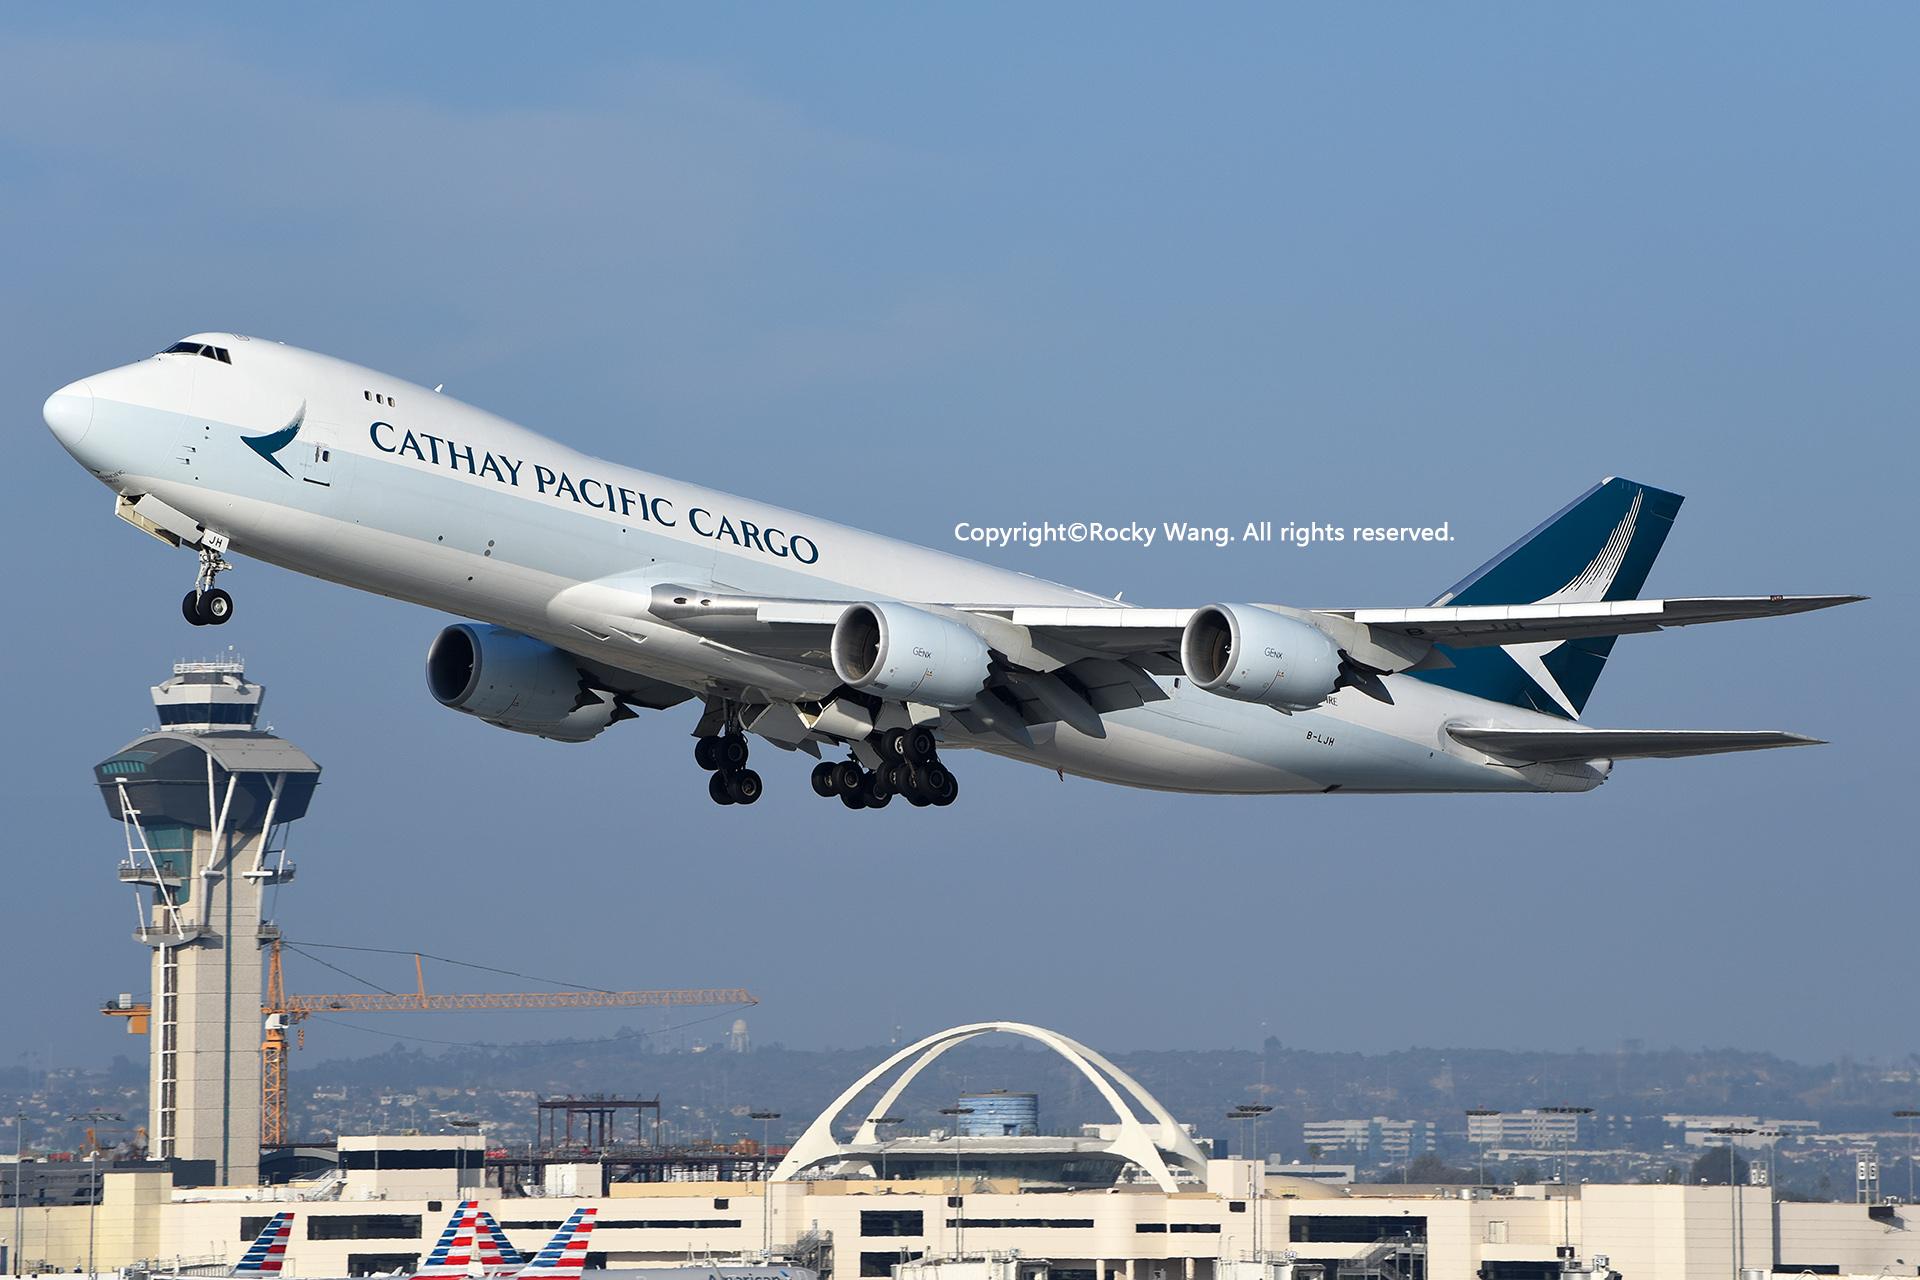 Re:[原创]随便来一组 不凑30图了 BOEING 747-867F B-LJH Los Angeles Int'l Airport